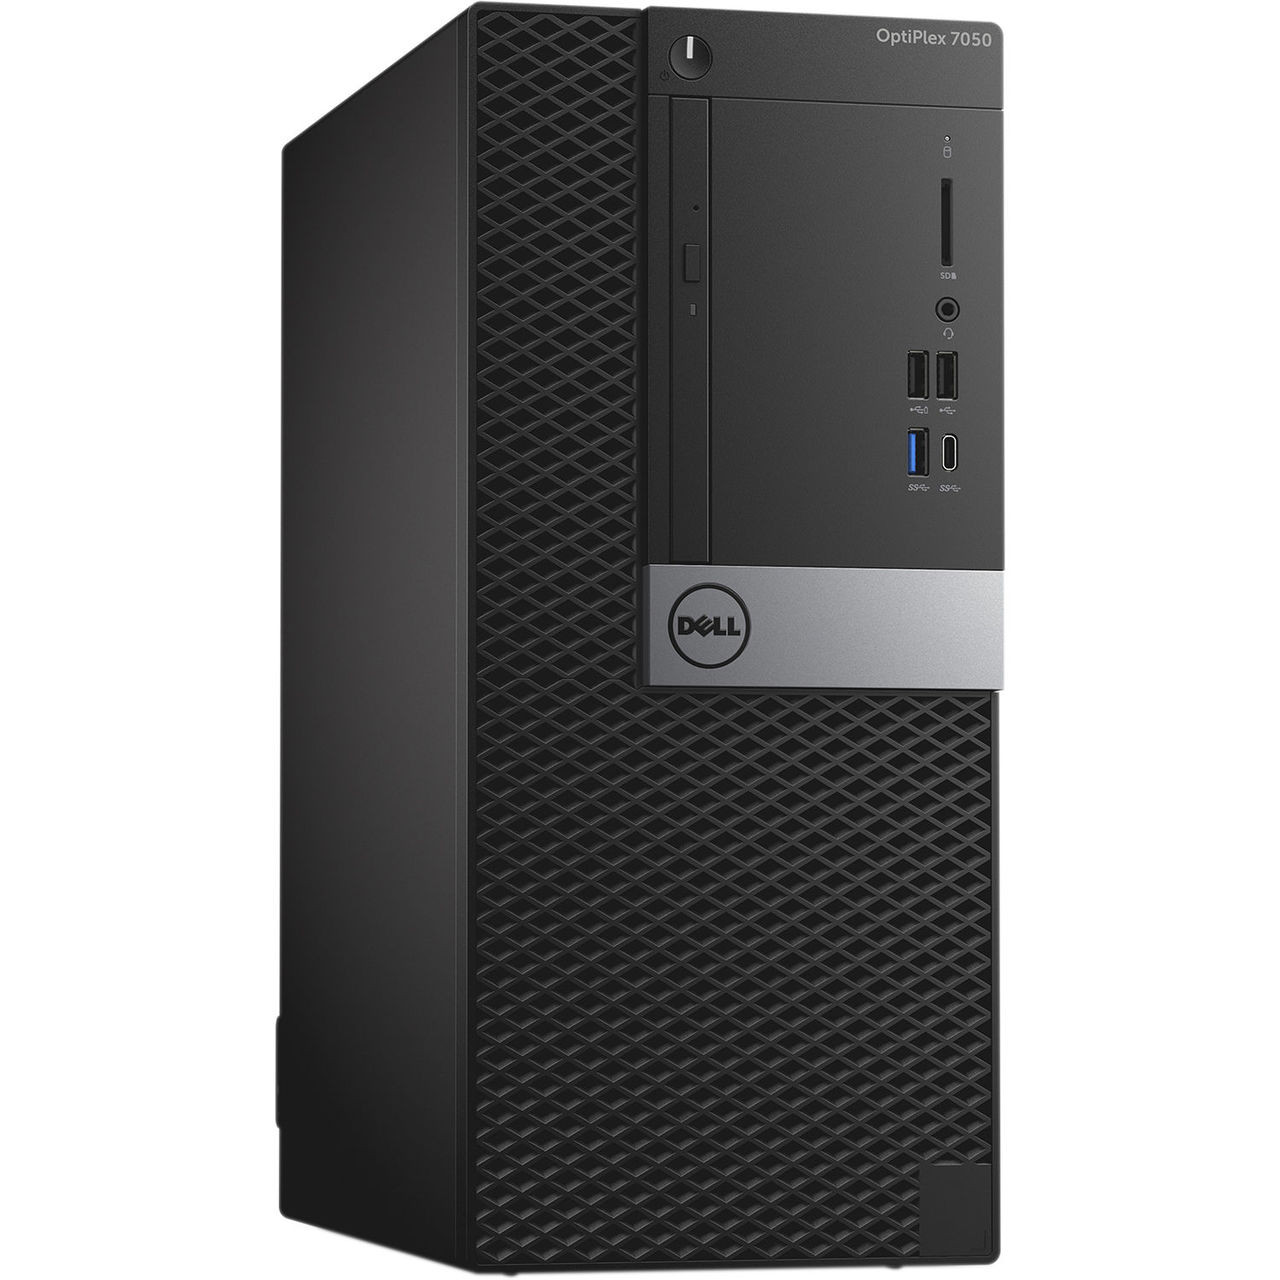 Dell Optiplex 7050 Tower Quad Core i7 3.4GHz, 8GB Ram, 500GB HDD, DVD-RW, Windows 10 Pro 64 Desktop Computer